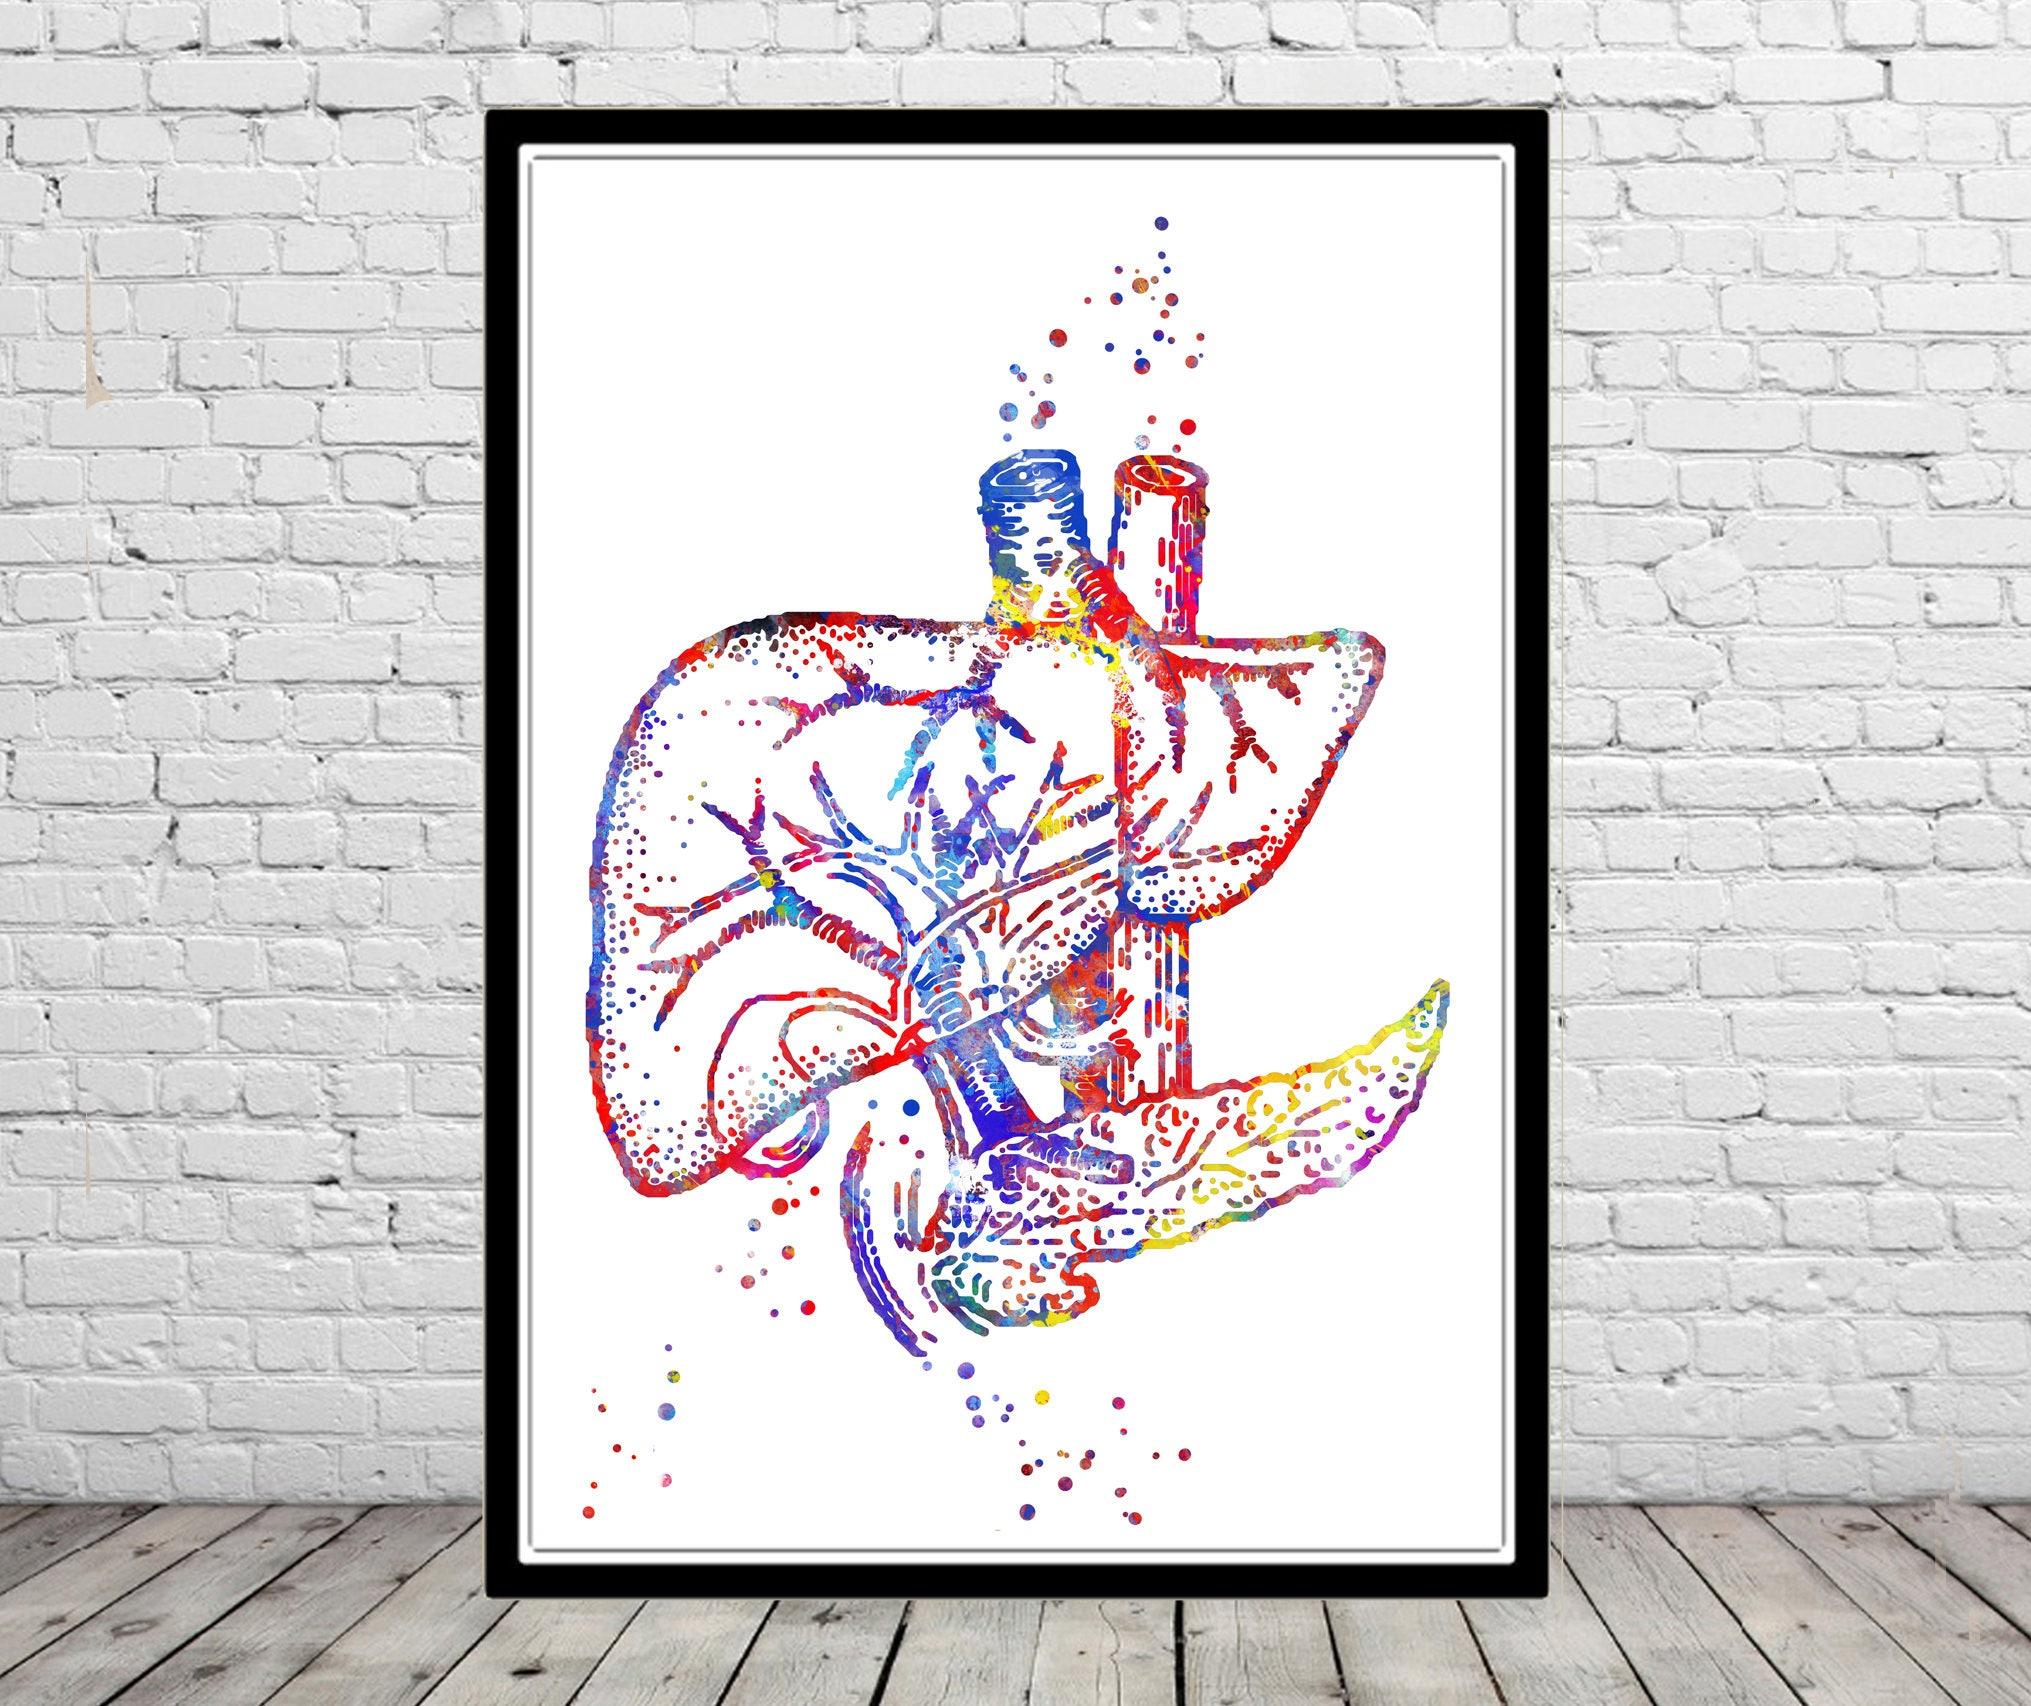 Leber menschliche Organe Leber Kunst Leber Anatomie | Etsy